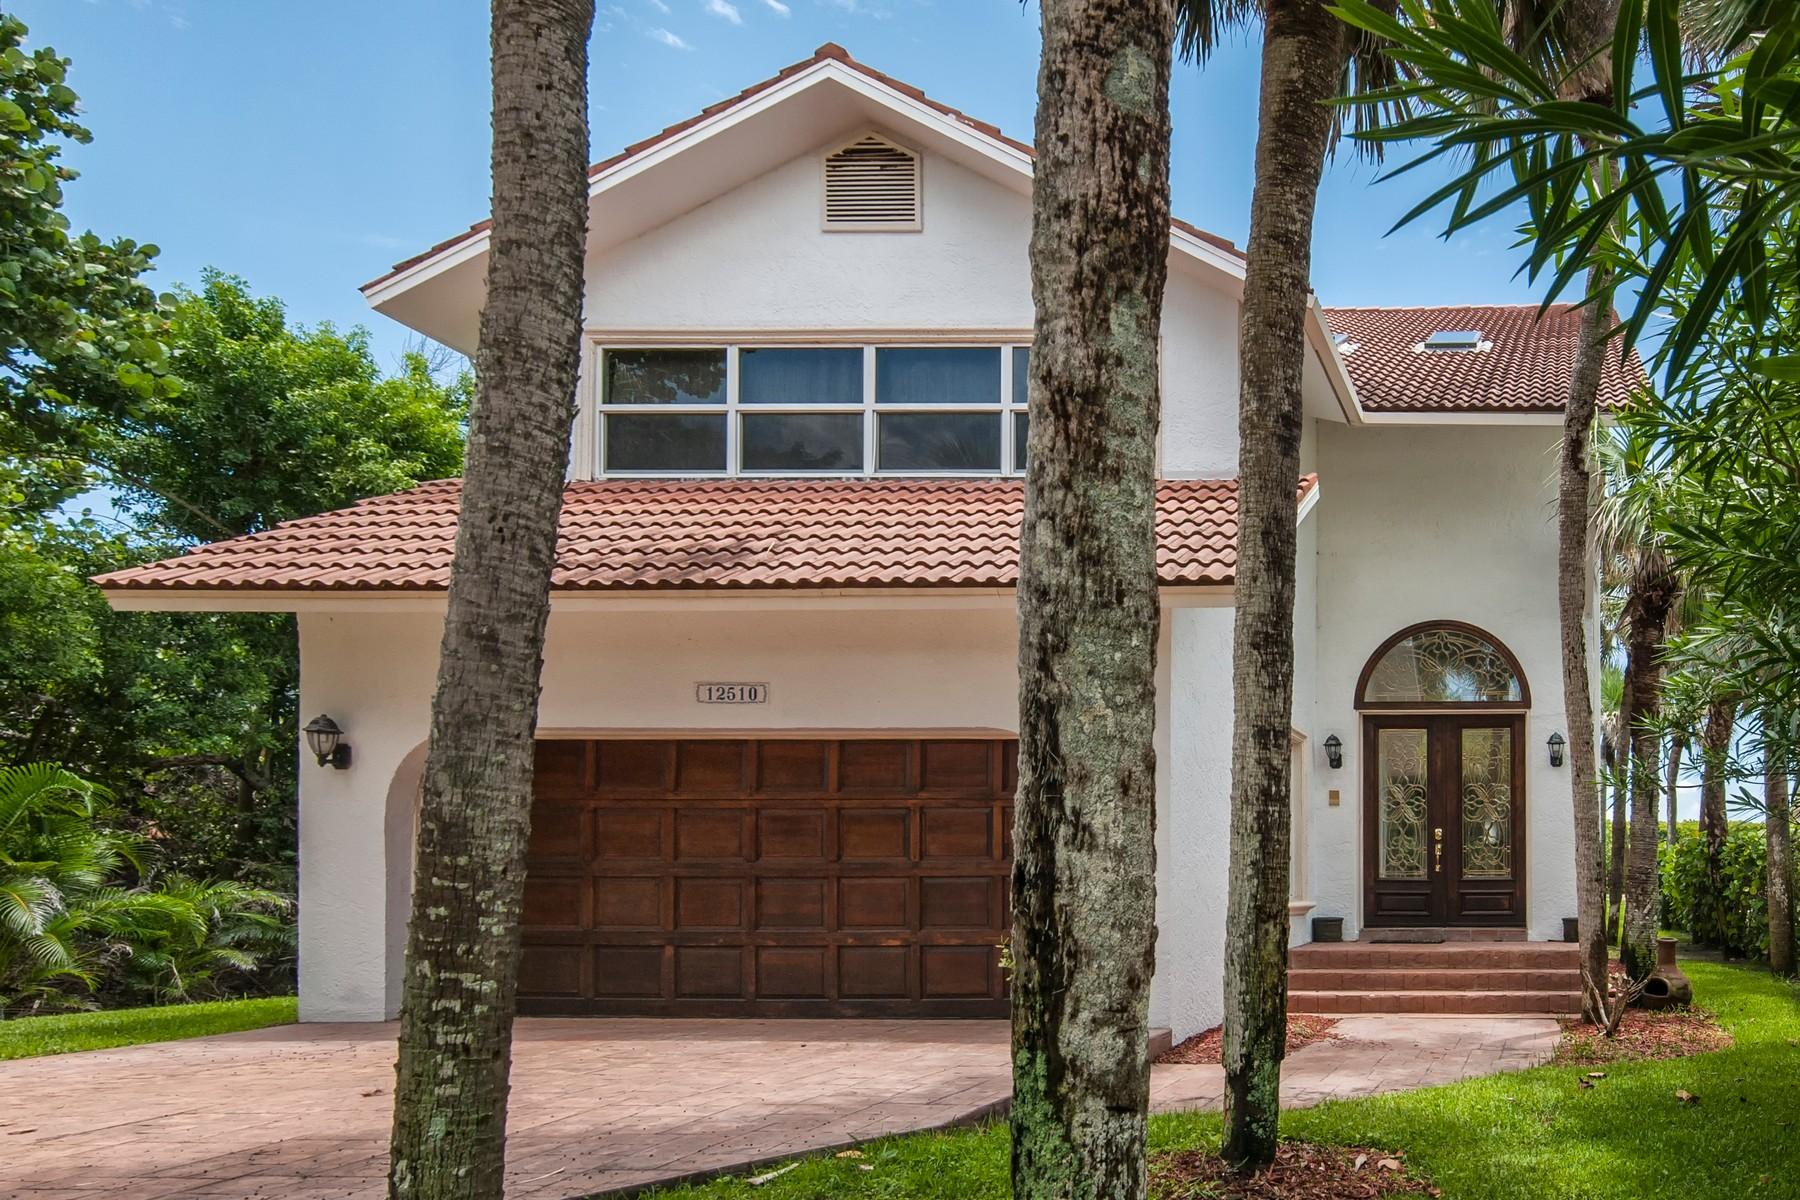 Villa per Vendita alle ore Ideal Beach House! 12510 Highway A1A Vero Beach, Florida, 32963 Stati Uniti